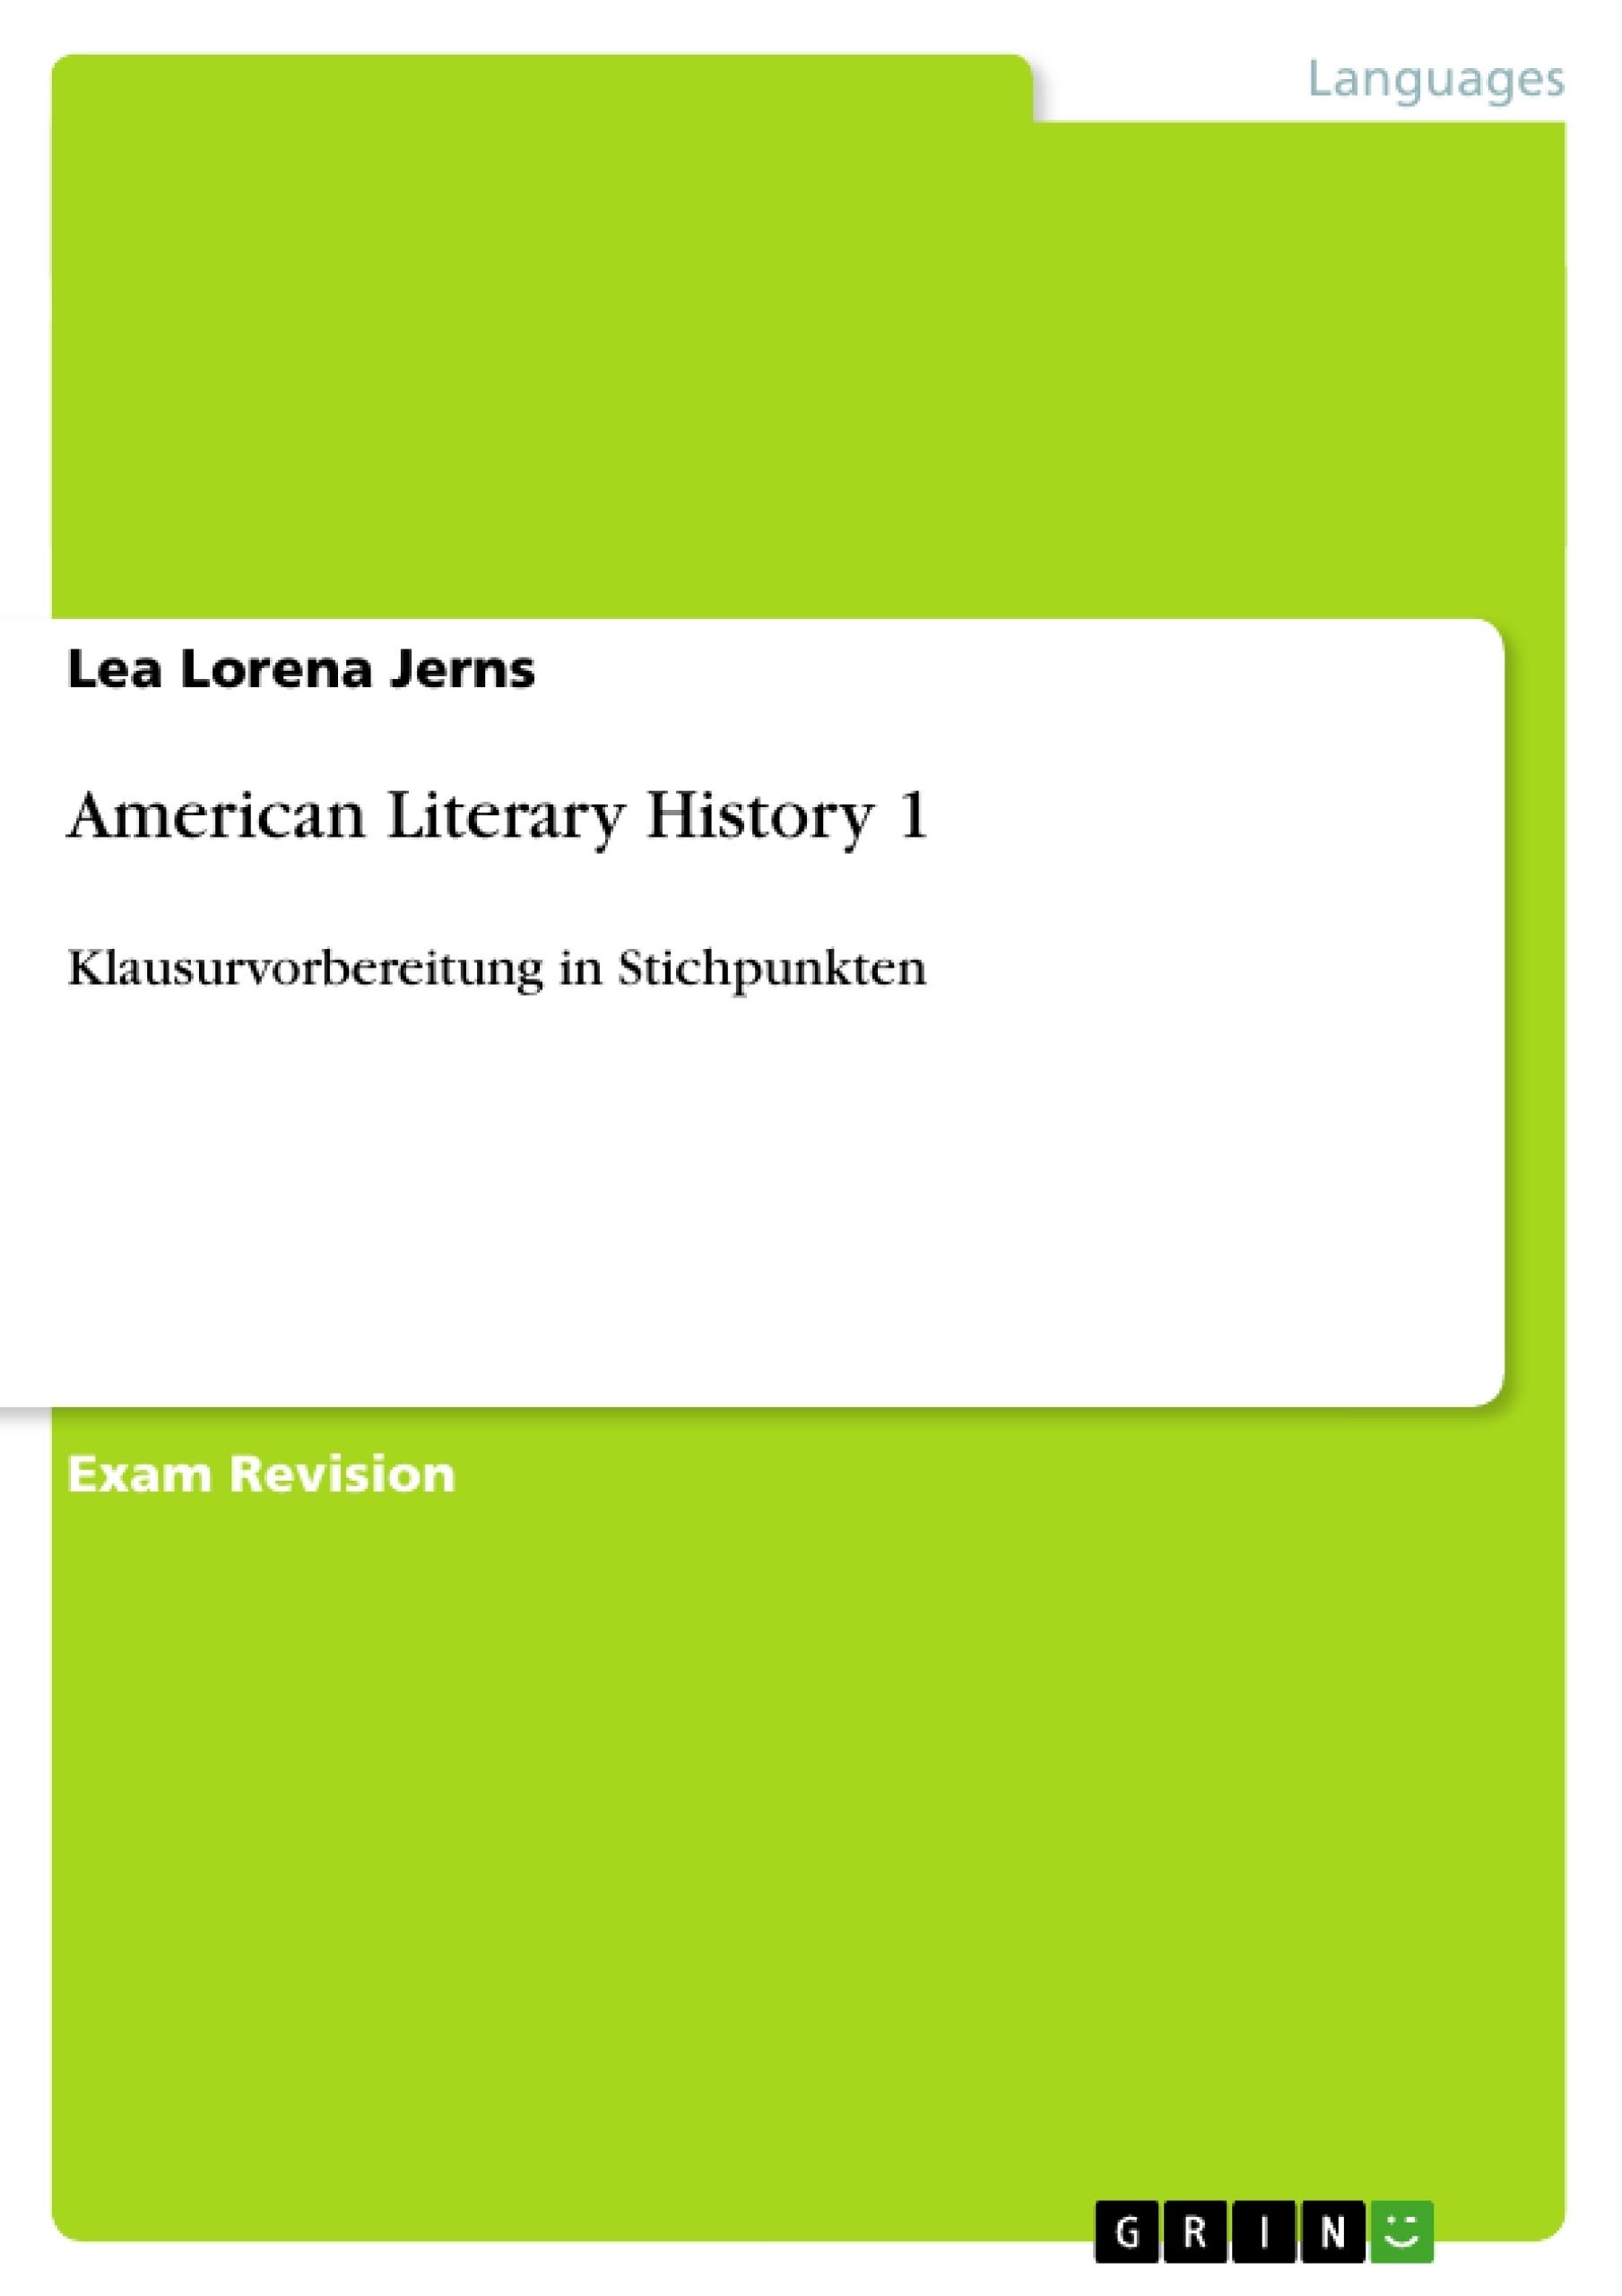 Title: American Literary History 1